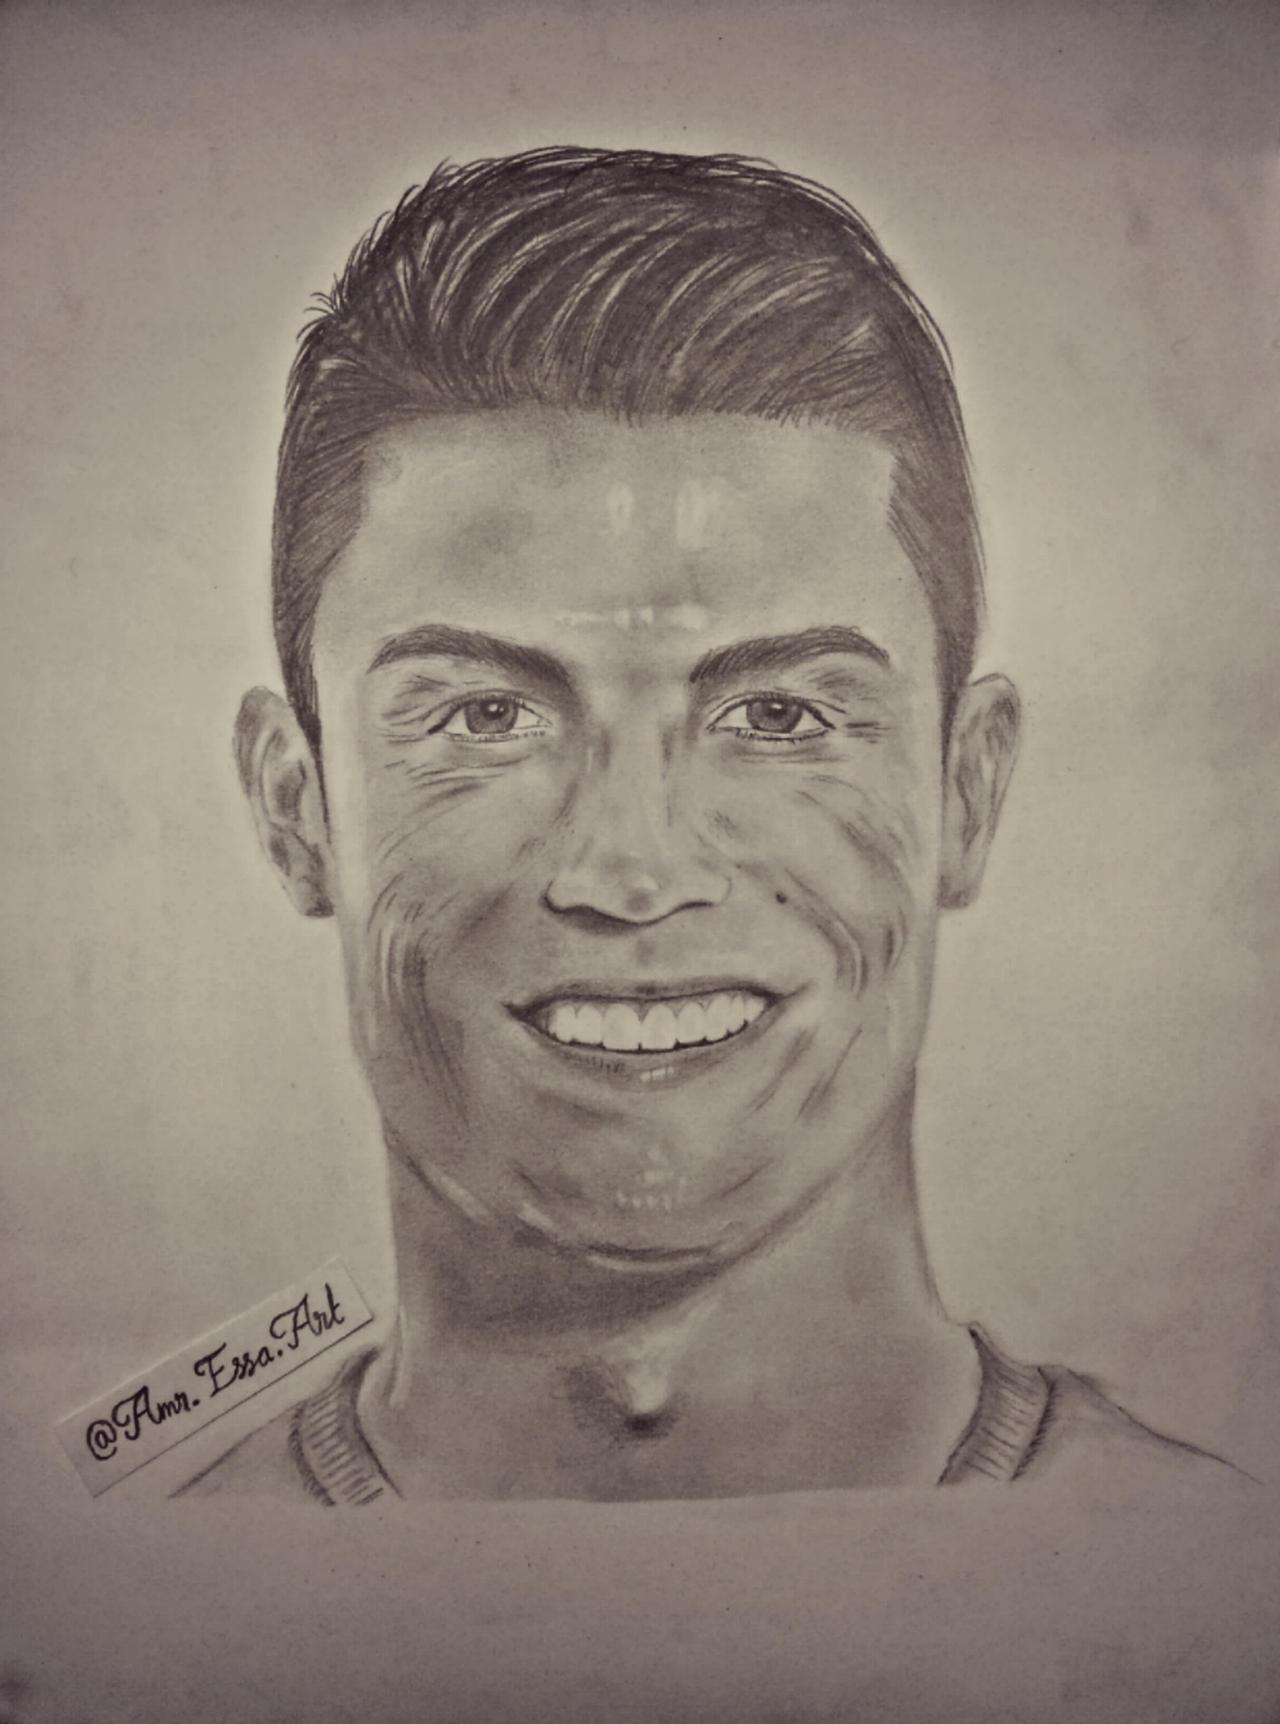 Cristiano Ronaldo Cr7 Pencil Drawing Portrait By Amressaart On Deviantart